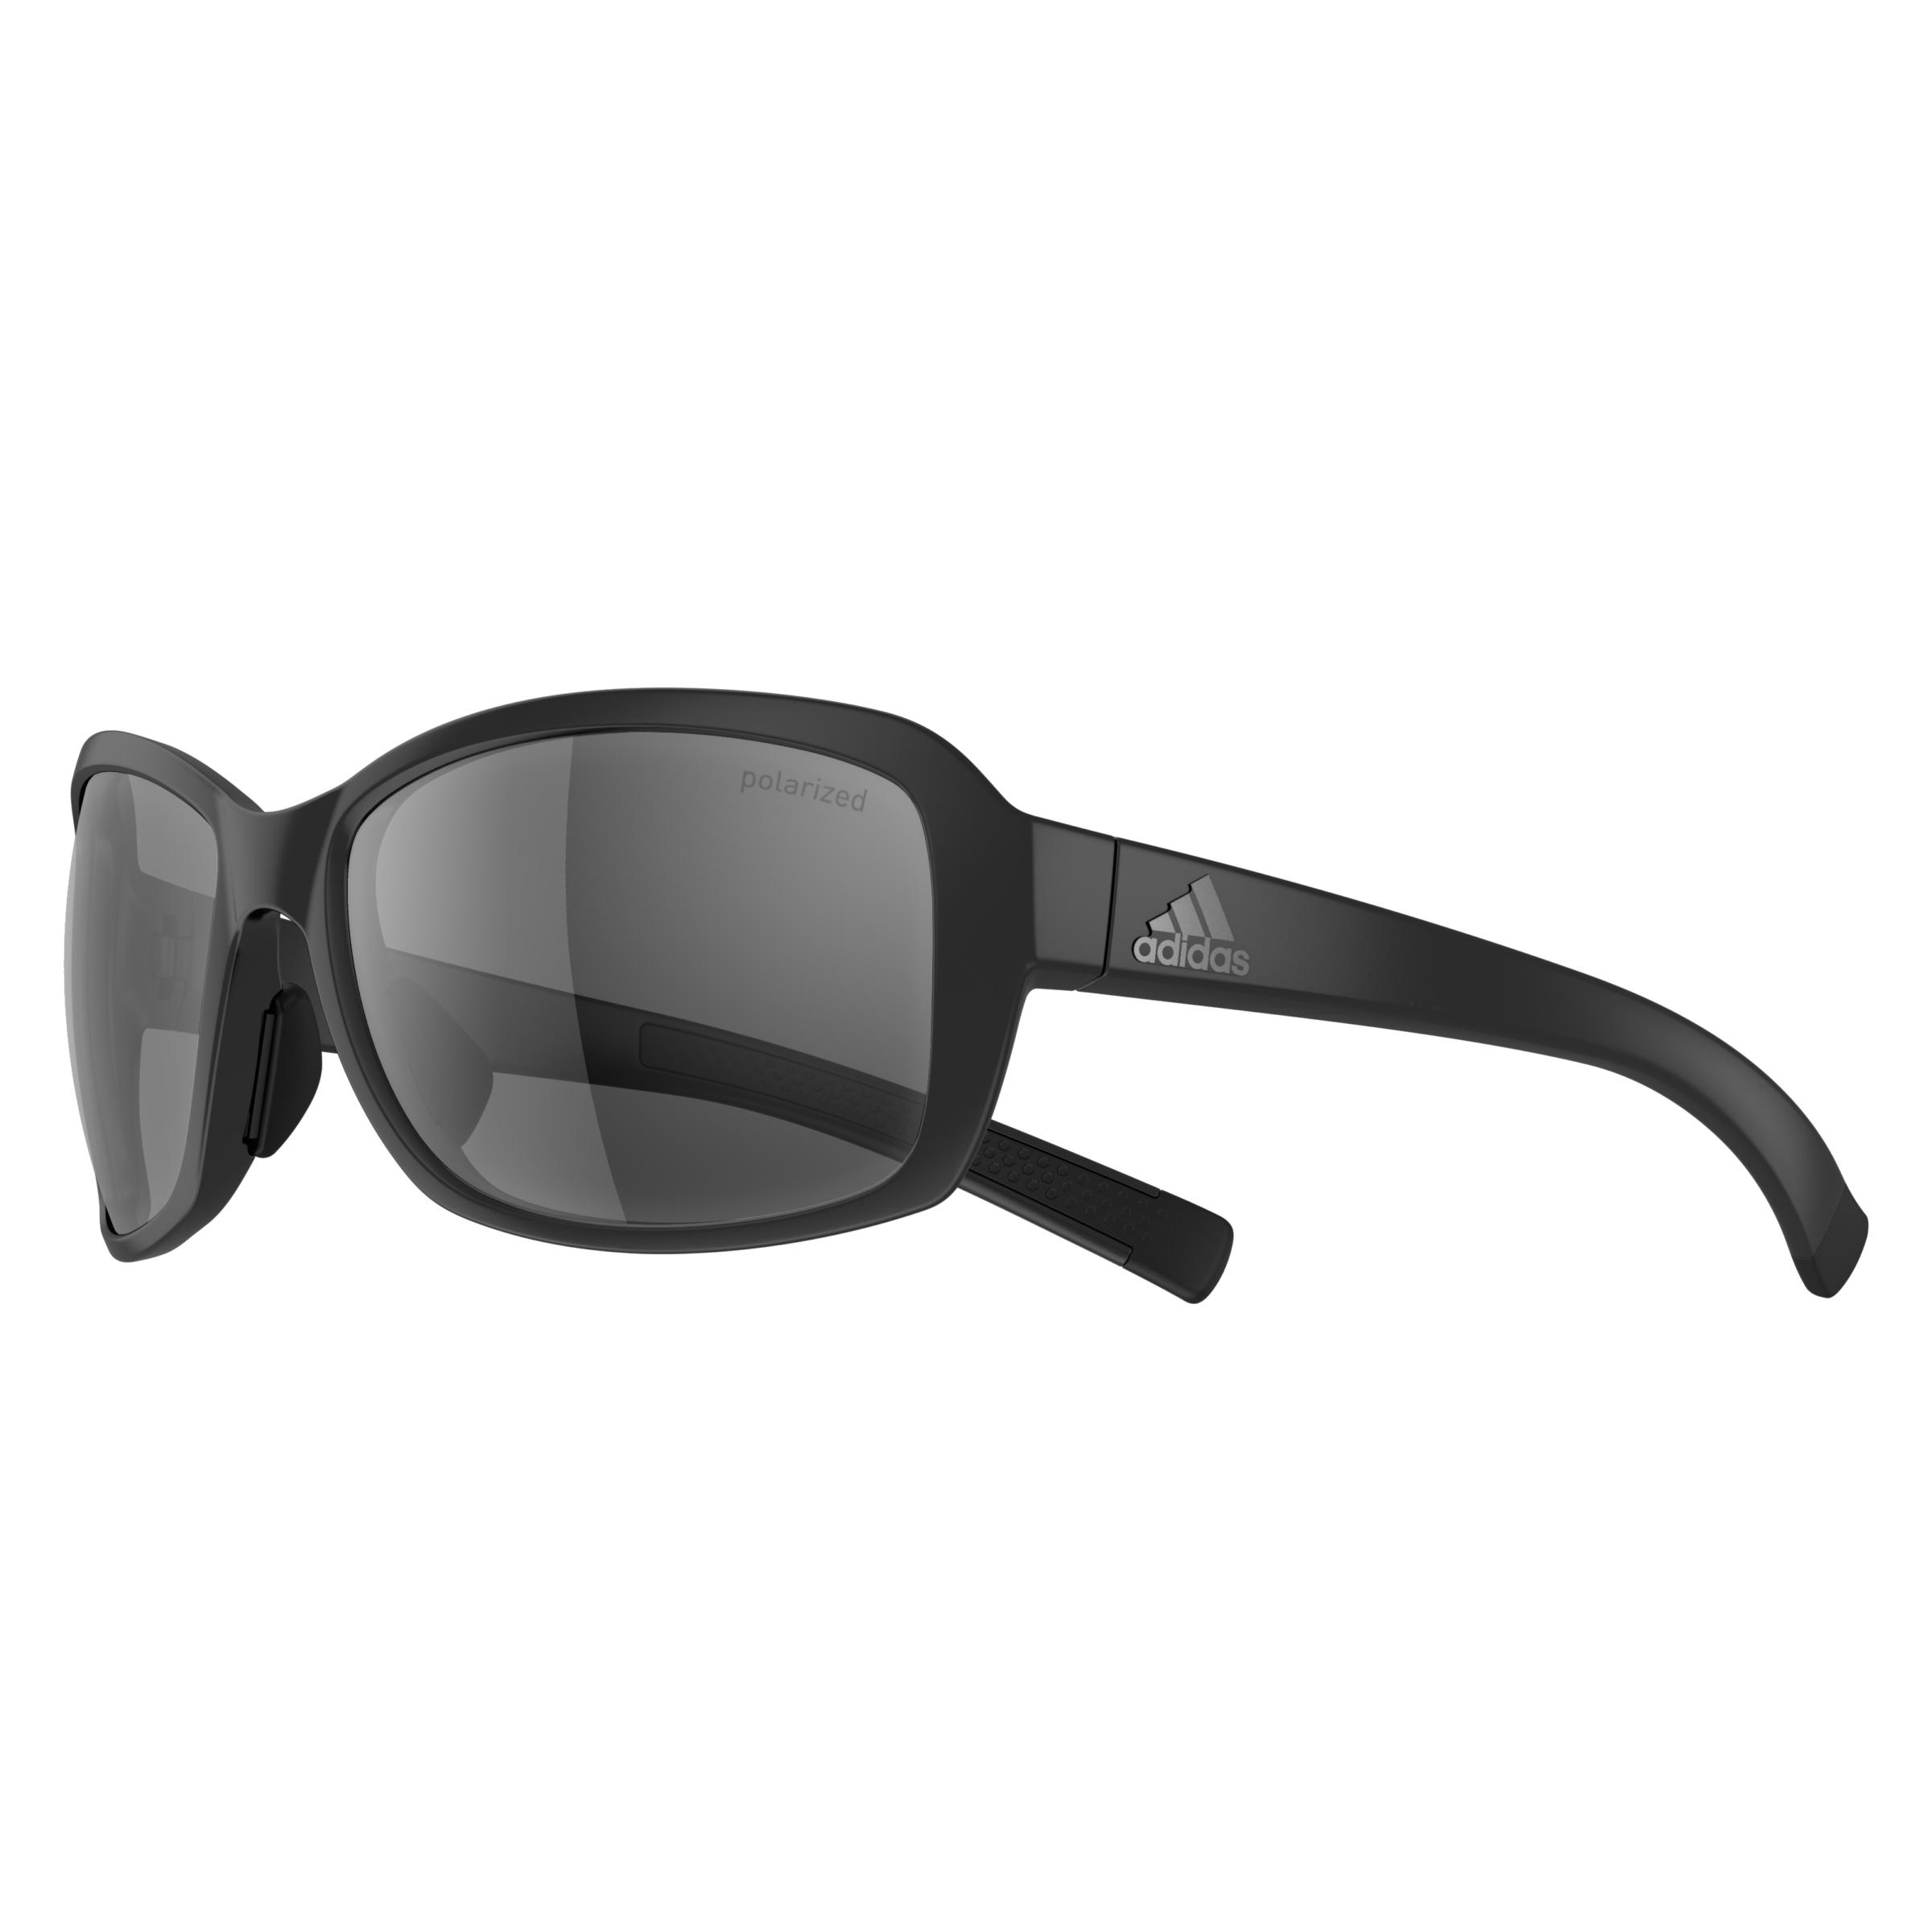 Adidas Baboa ad21 6051 vapour grey matt OICSc28PuV